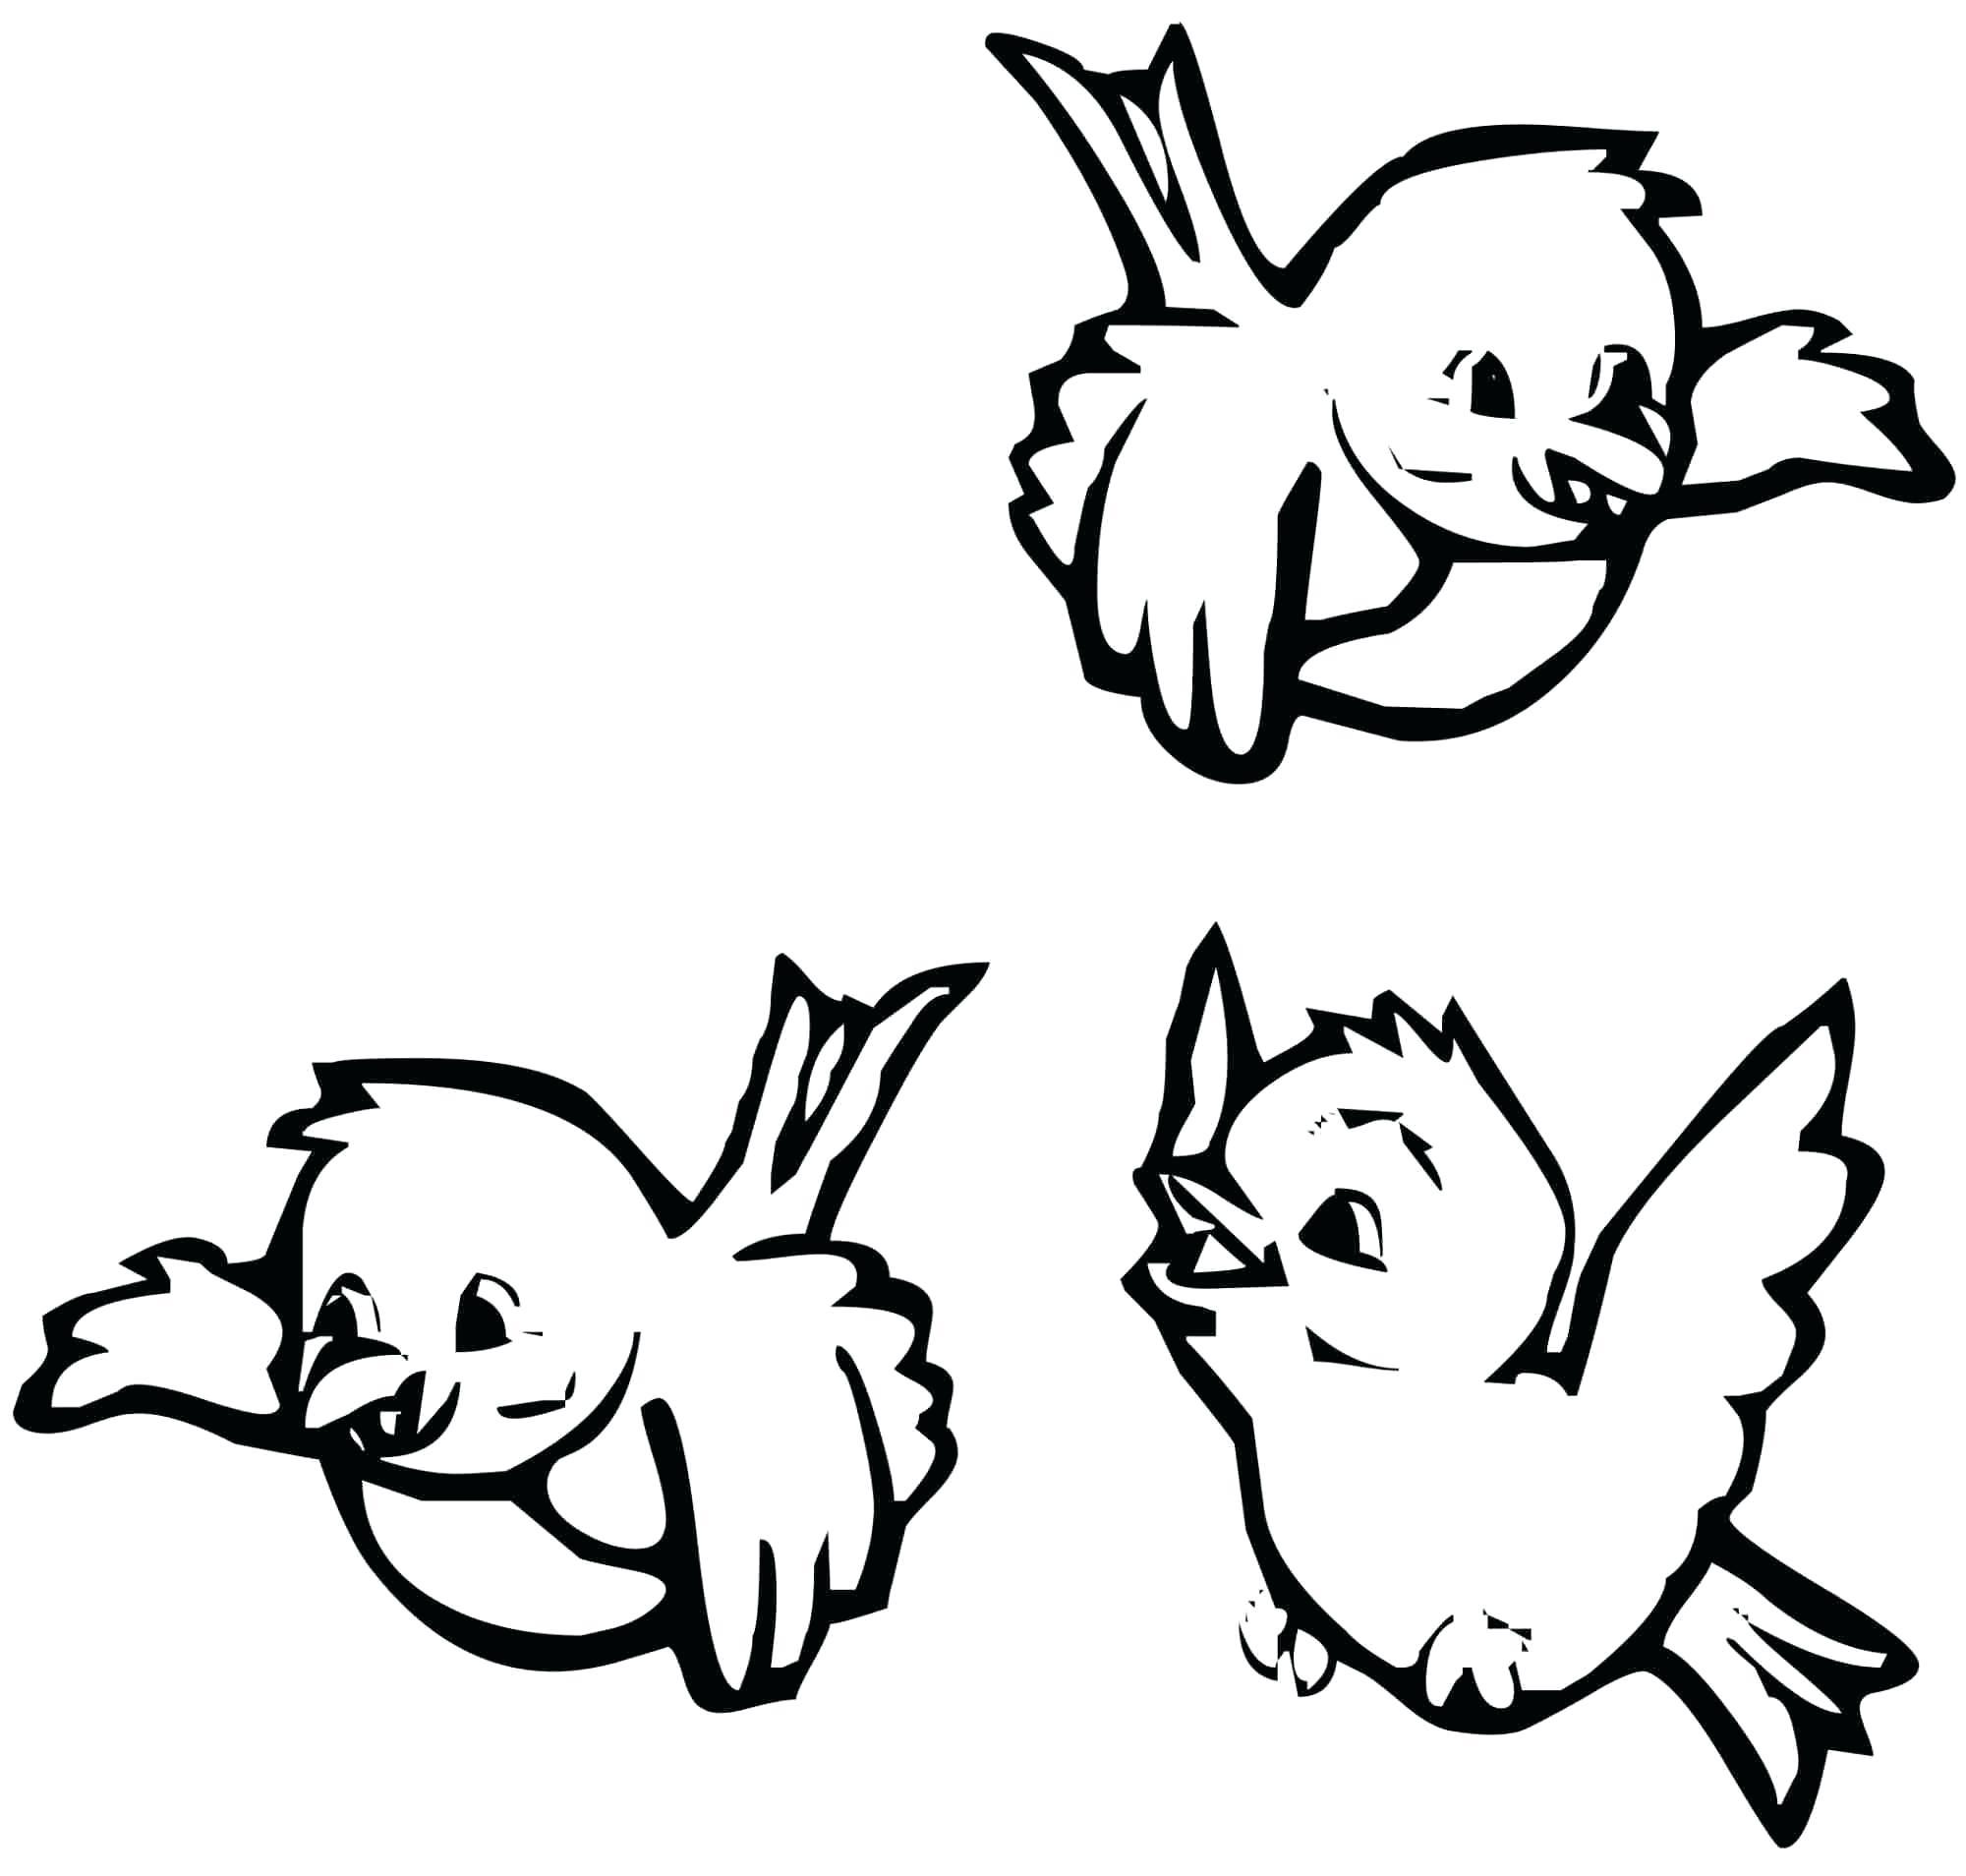 Flying Bird Line Drawing At Getdrawings